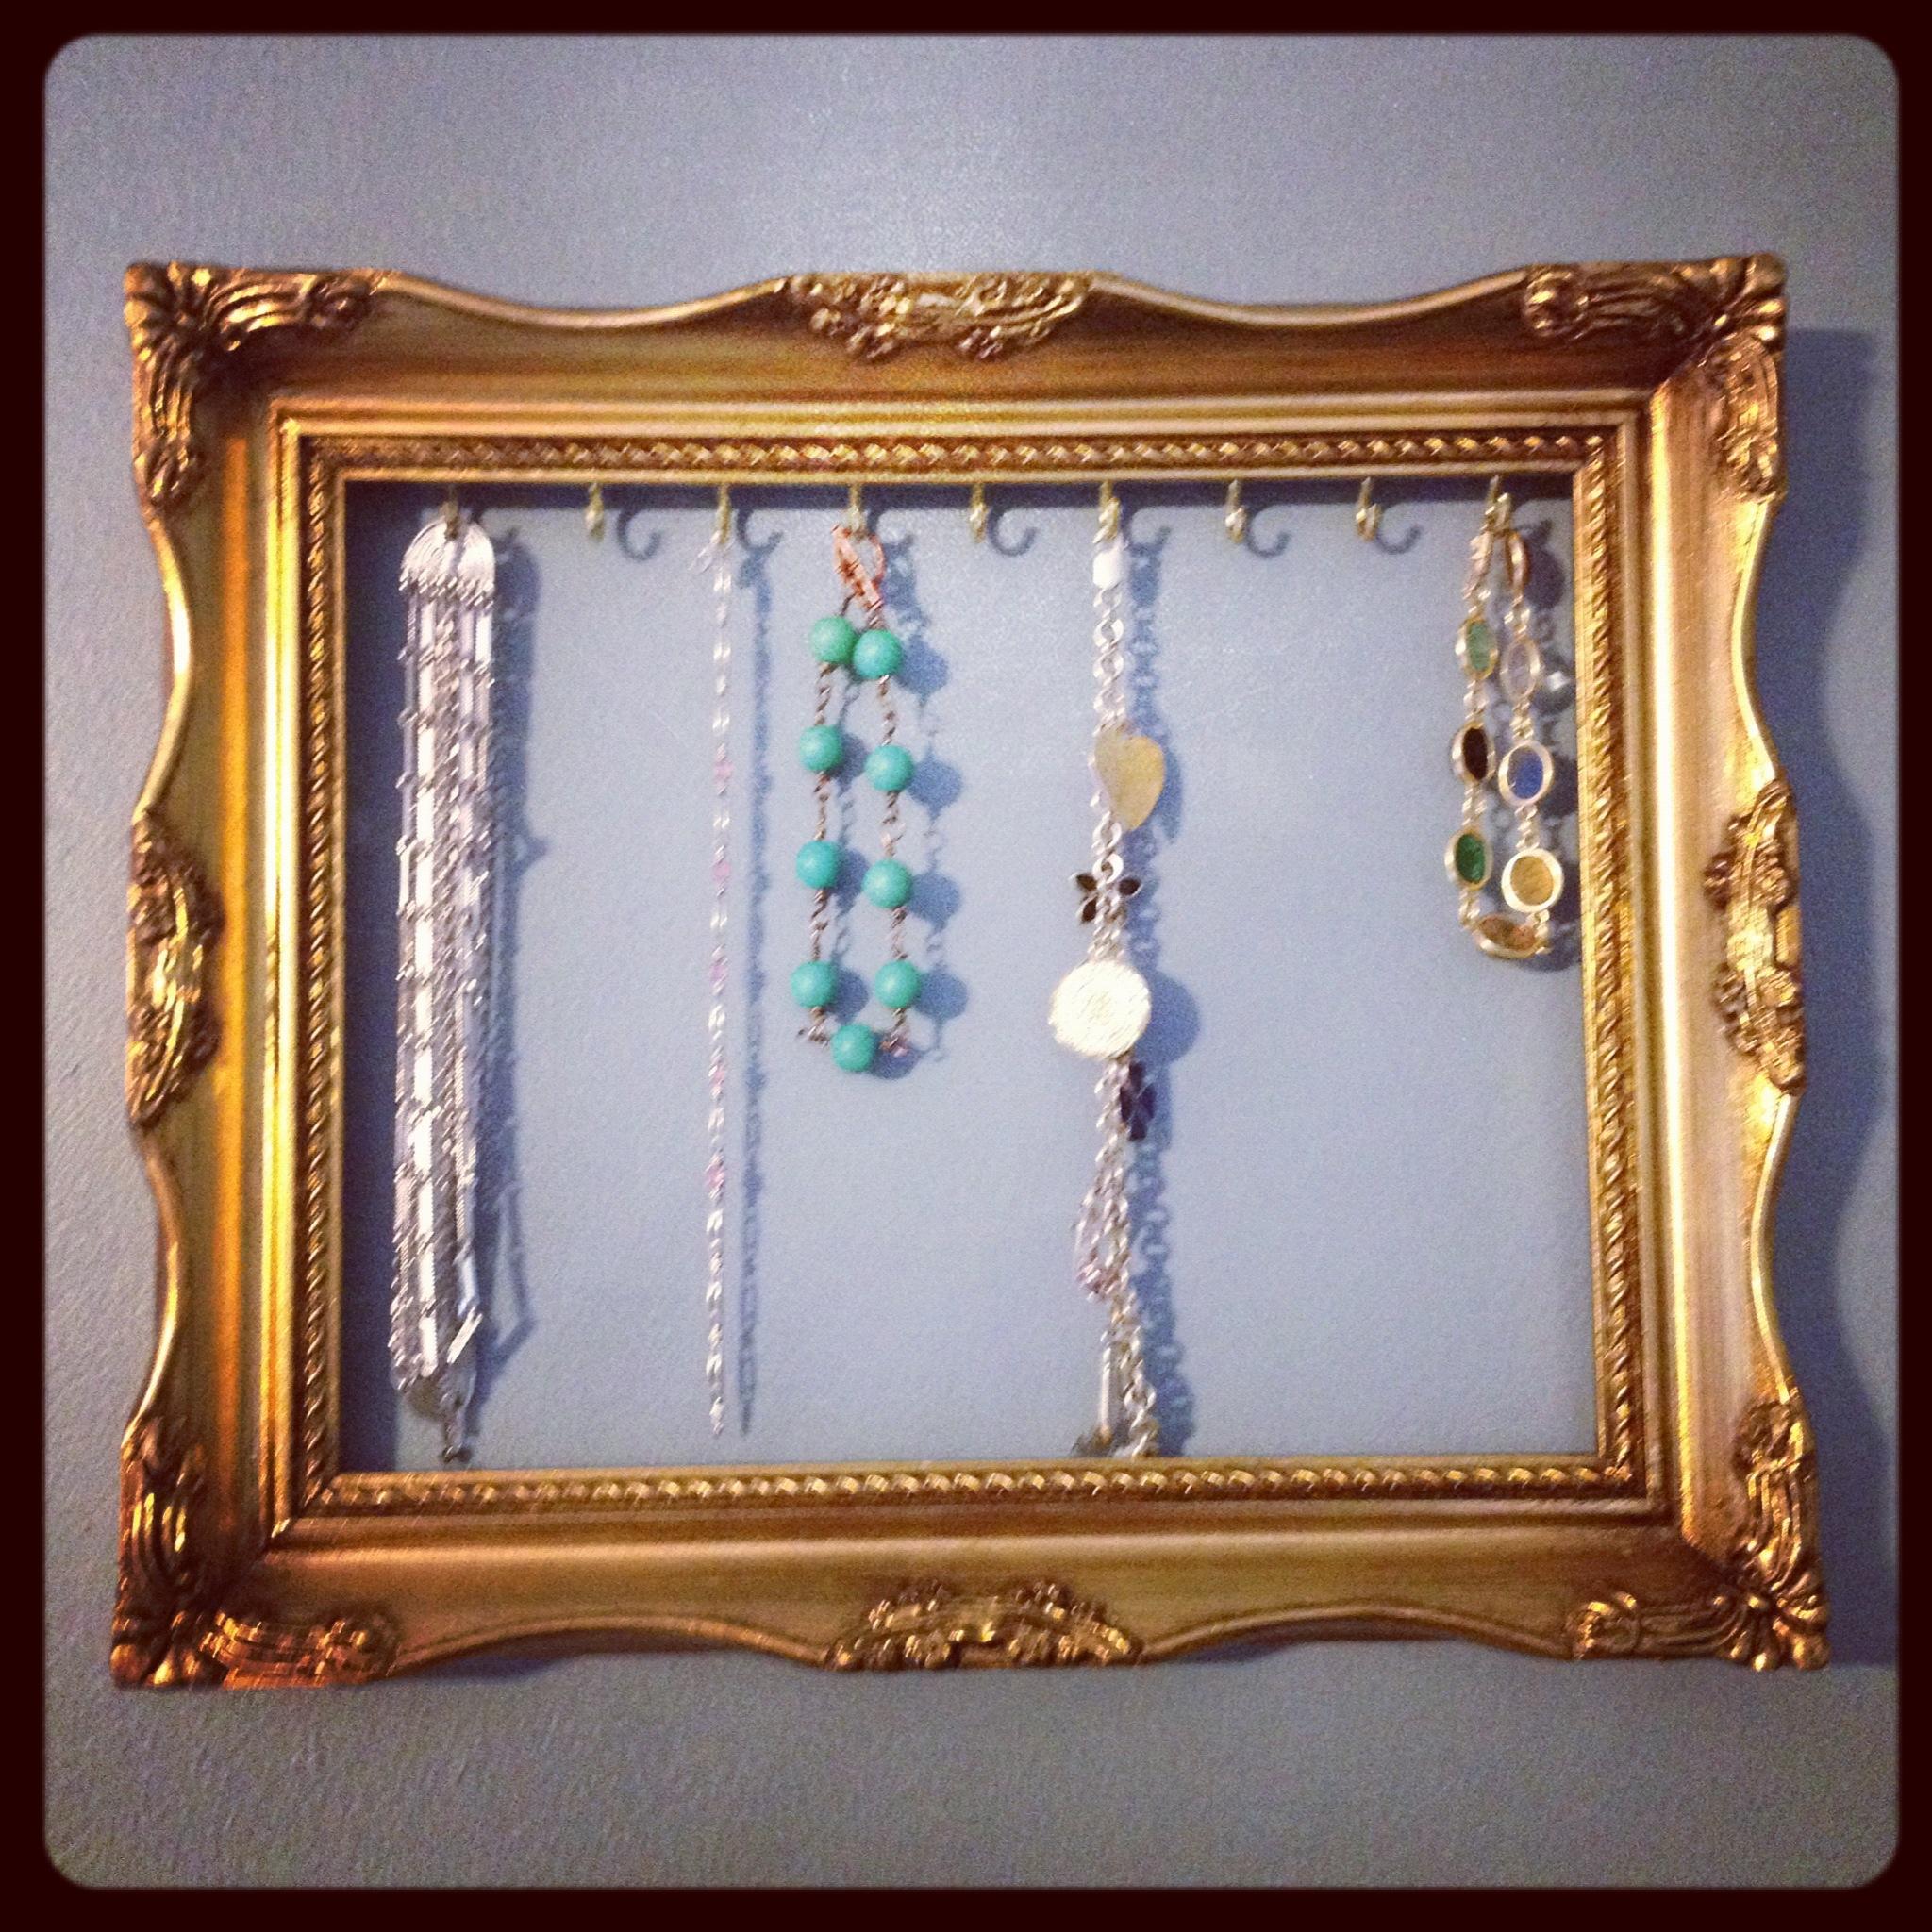 Custom Jewelry Display Frame: Vintage Inspired Jewelry Displays